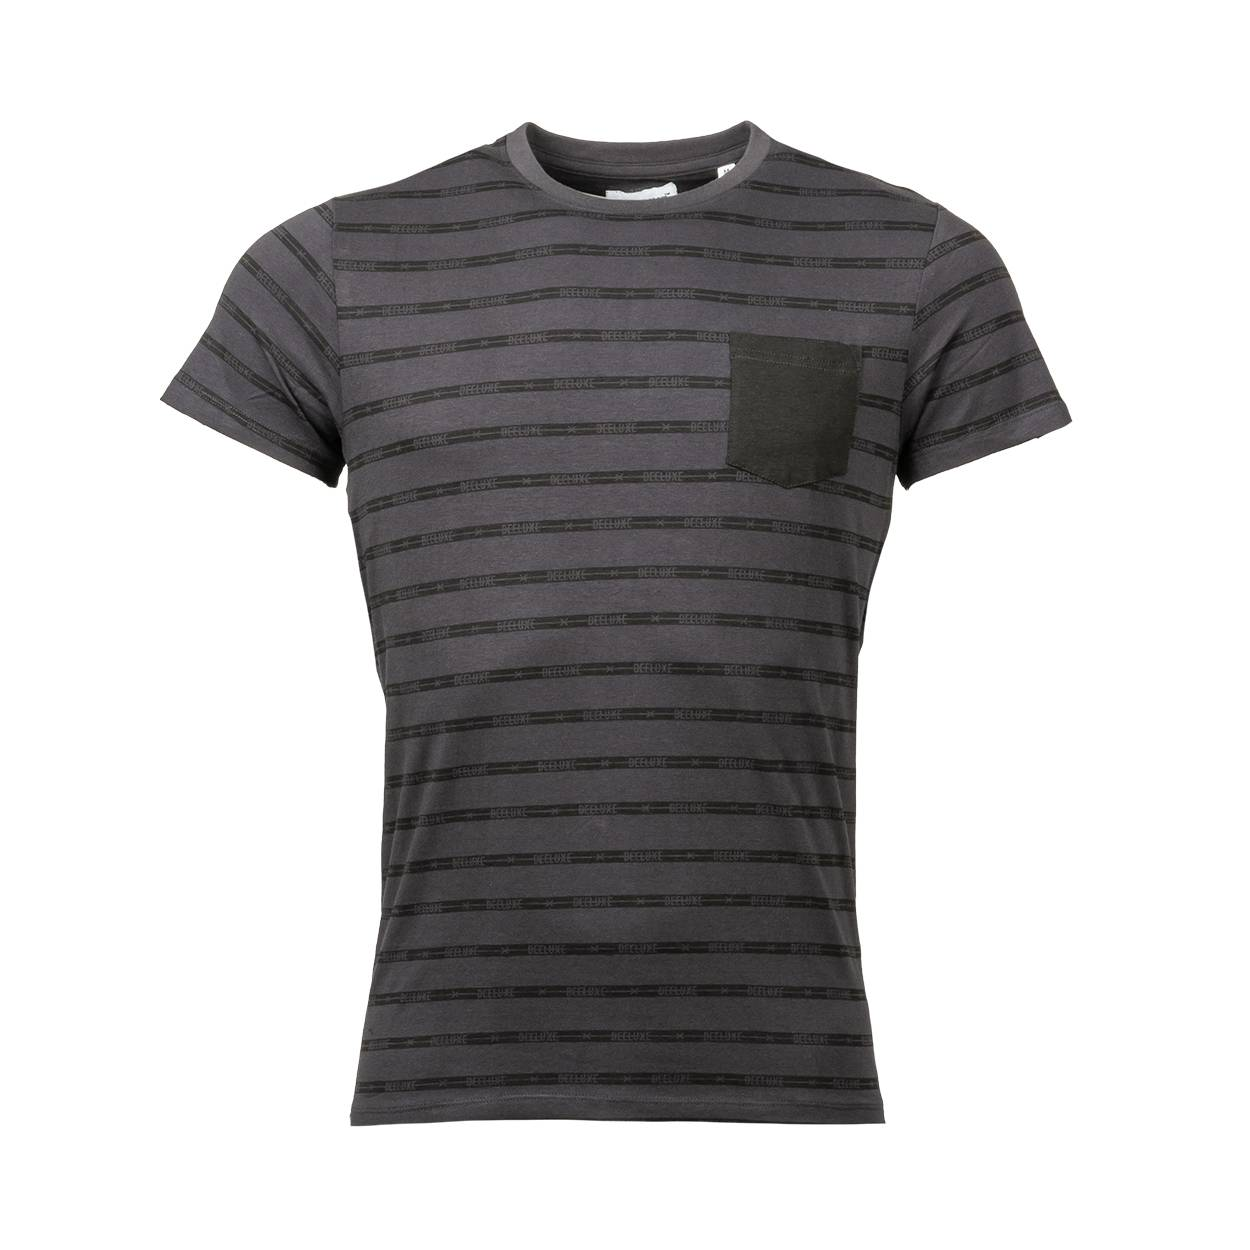 Deeluxe Est. 74 Tee-shirt col rond Deeluxe Est. 74 Closed en coton stretch gris anthracite à rayures noires - GRIS ANTHRACITE - S